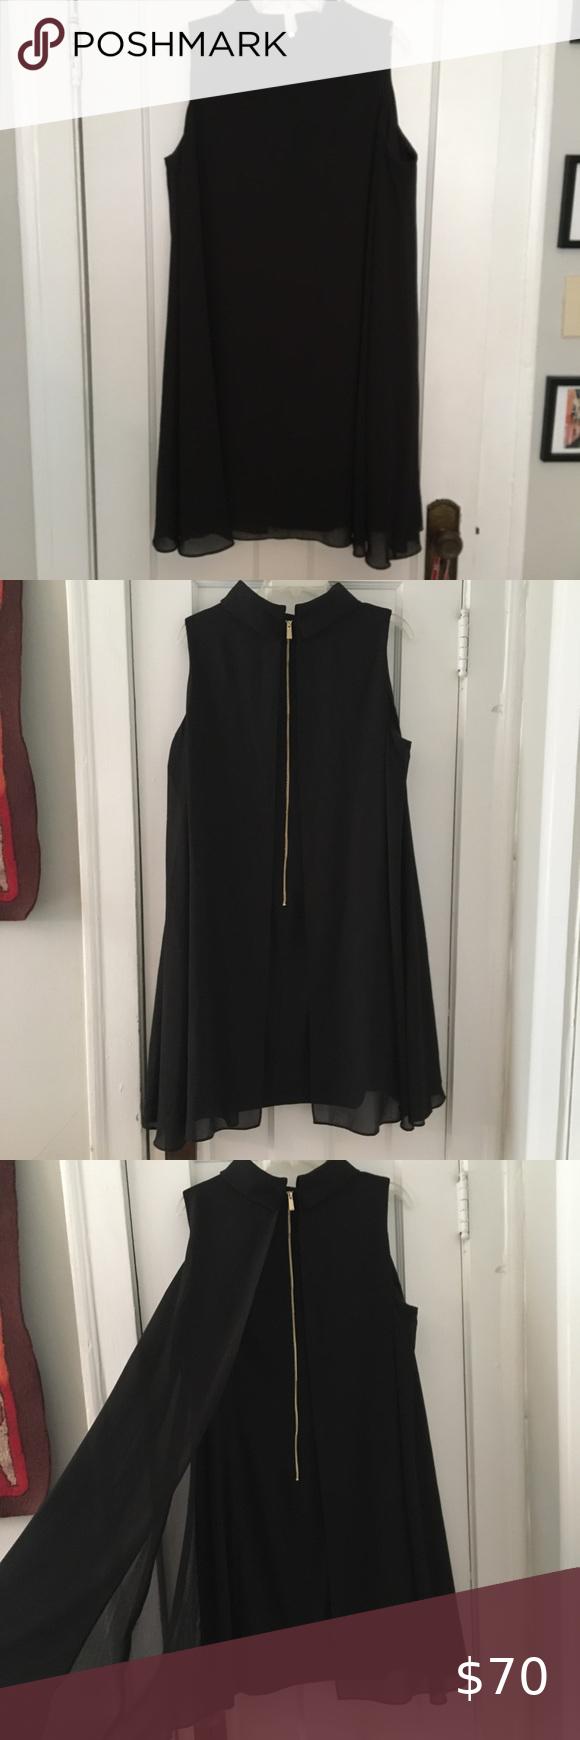 Vince Camuto Black Cape Effect Shift Dress 18w This Chic Short Black Polyester Shift Dress Has A Flattering Cape E Shift Dress Clothes Design Colorful Dresses [ 1740 x 580 Pixel ]